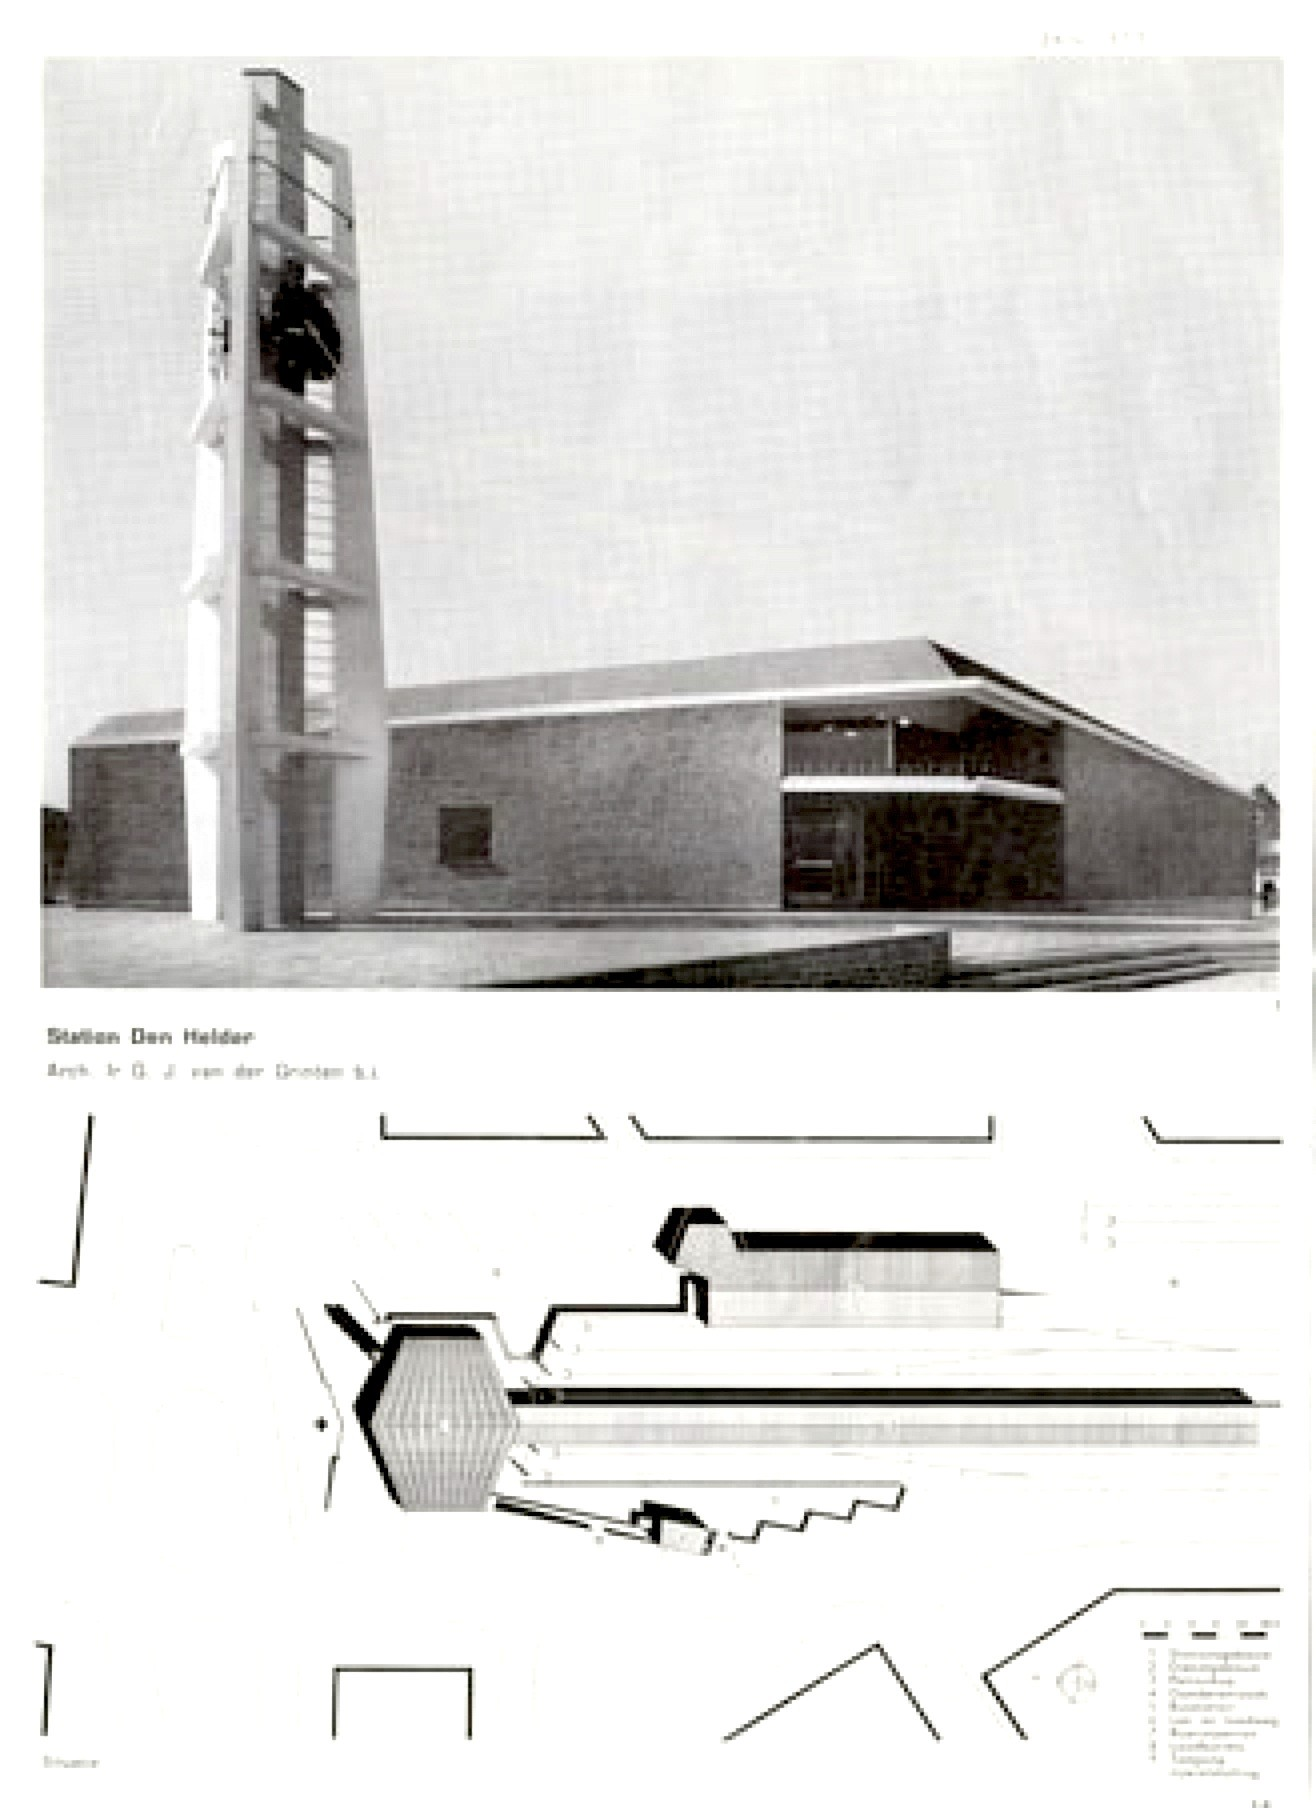 Station Den Helder 1